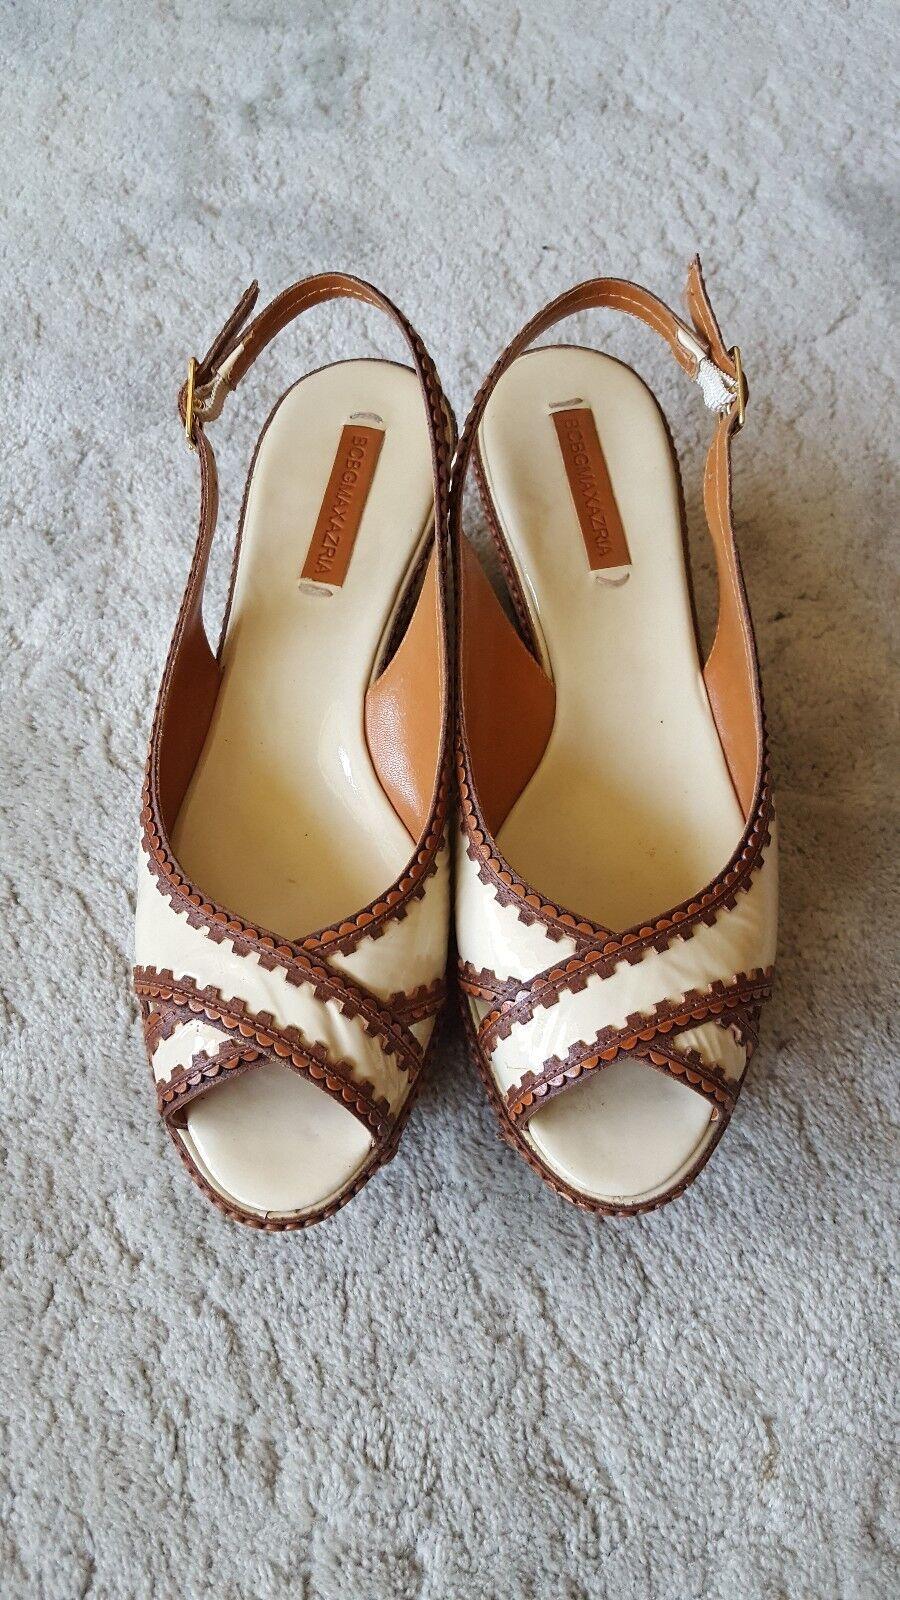 BCBG MAXAZRIA Morrisa Vapor Tan Wedge Sandals Taille 9 Slingback